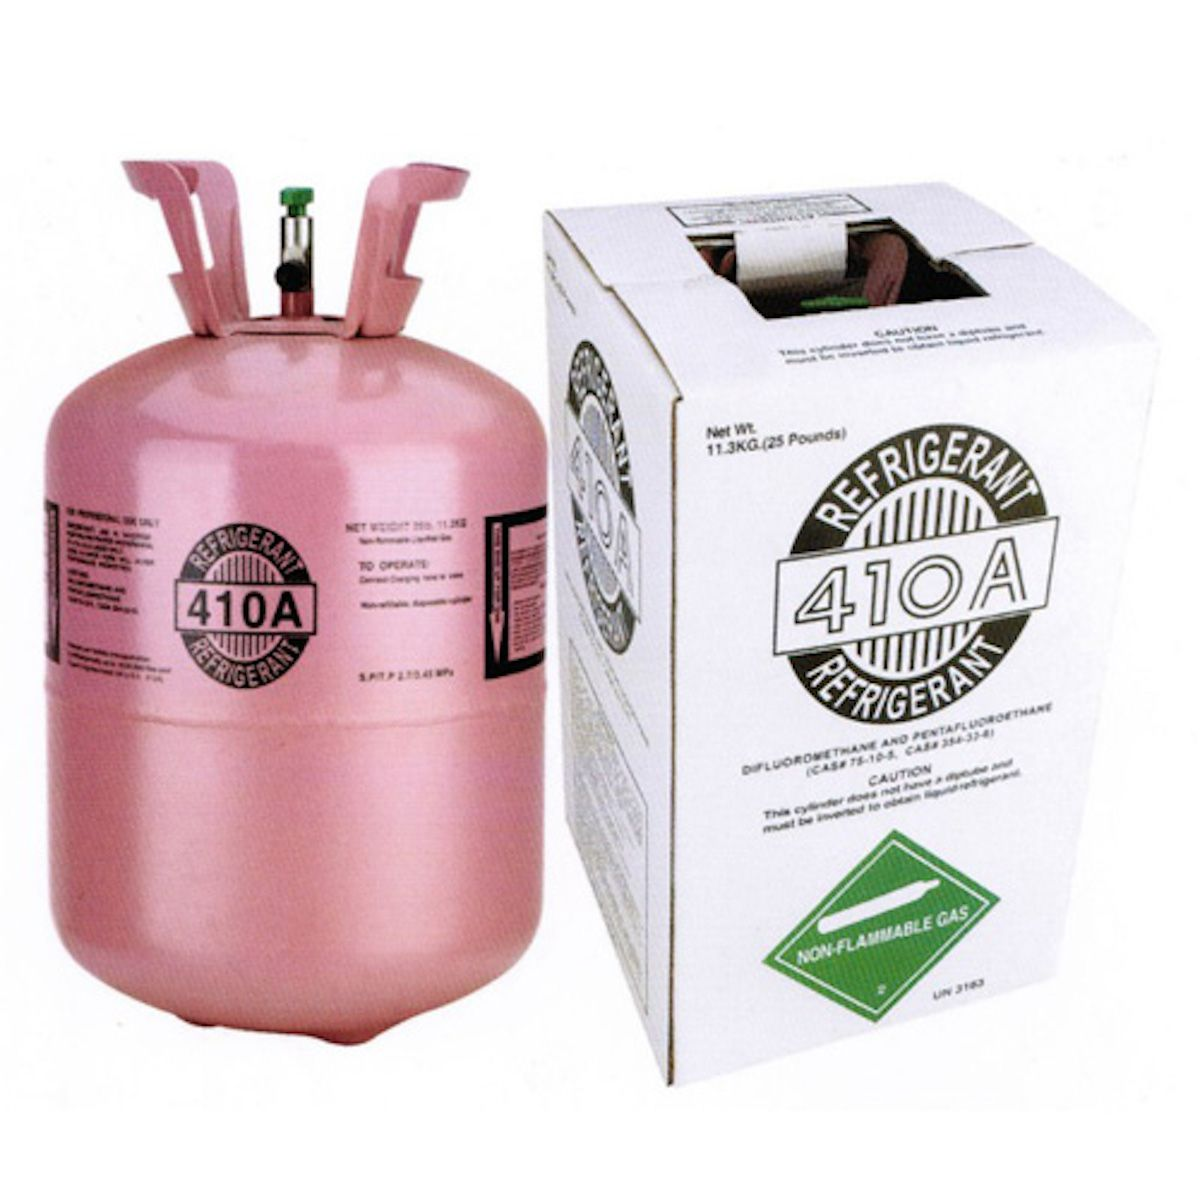 Varies R410a 25lb Refrigerant Carrier Hvac